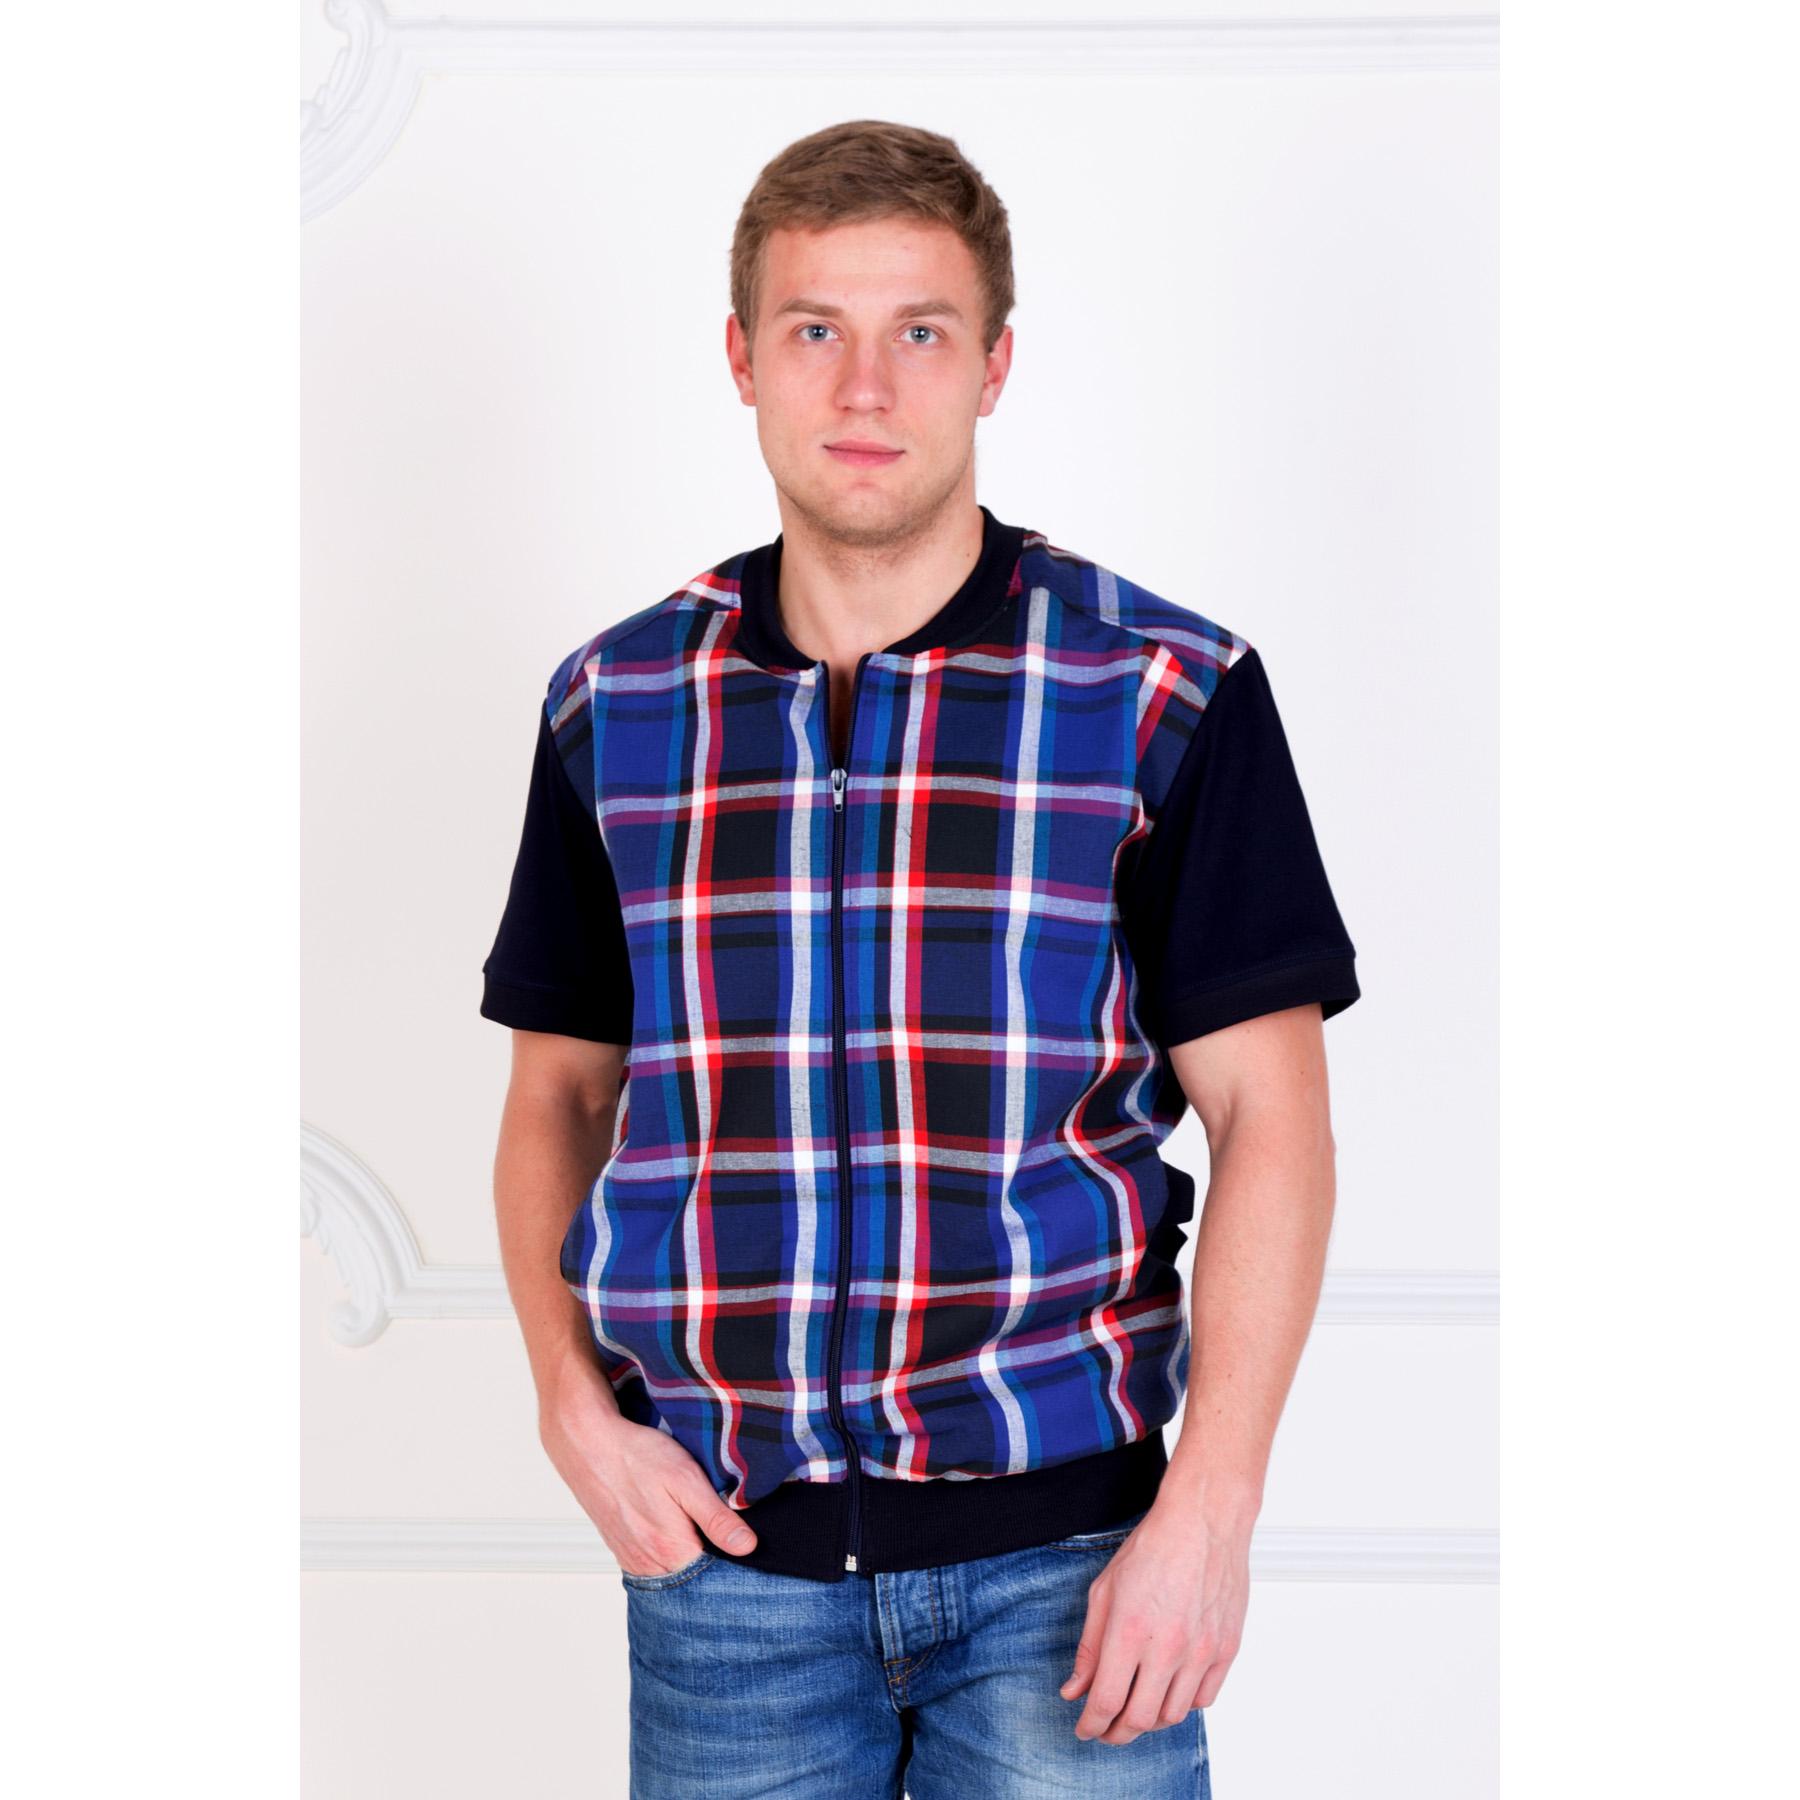 Мужская рубашка «Аполлон» , размер 46Толстовки, джемпера и рубашки<br>Обхват груди:92 см<br>Обхват талии:84 см<br>Обхват бедер:100 см<br>Рост:172-180 см<br><br>Тип: Муж. рубашка<br>Размер: 46<br>Материал: Шотландка